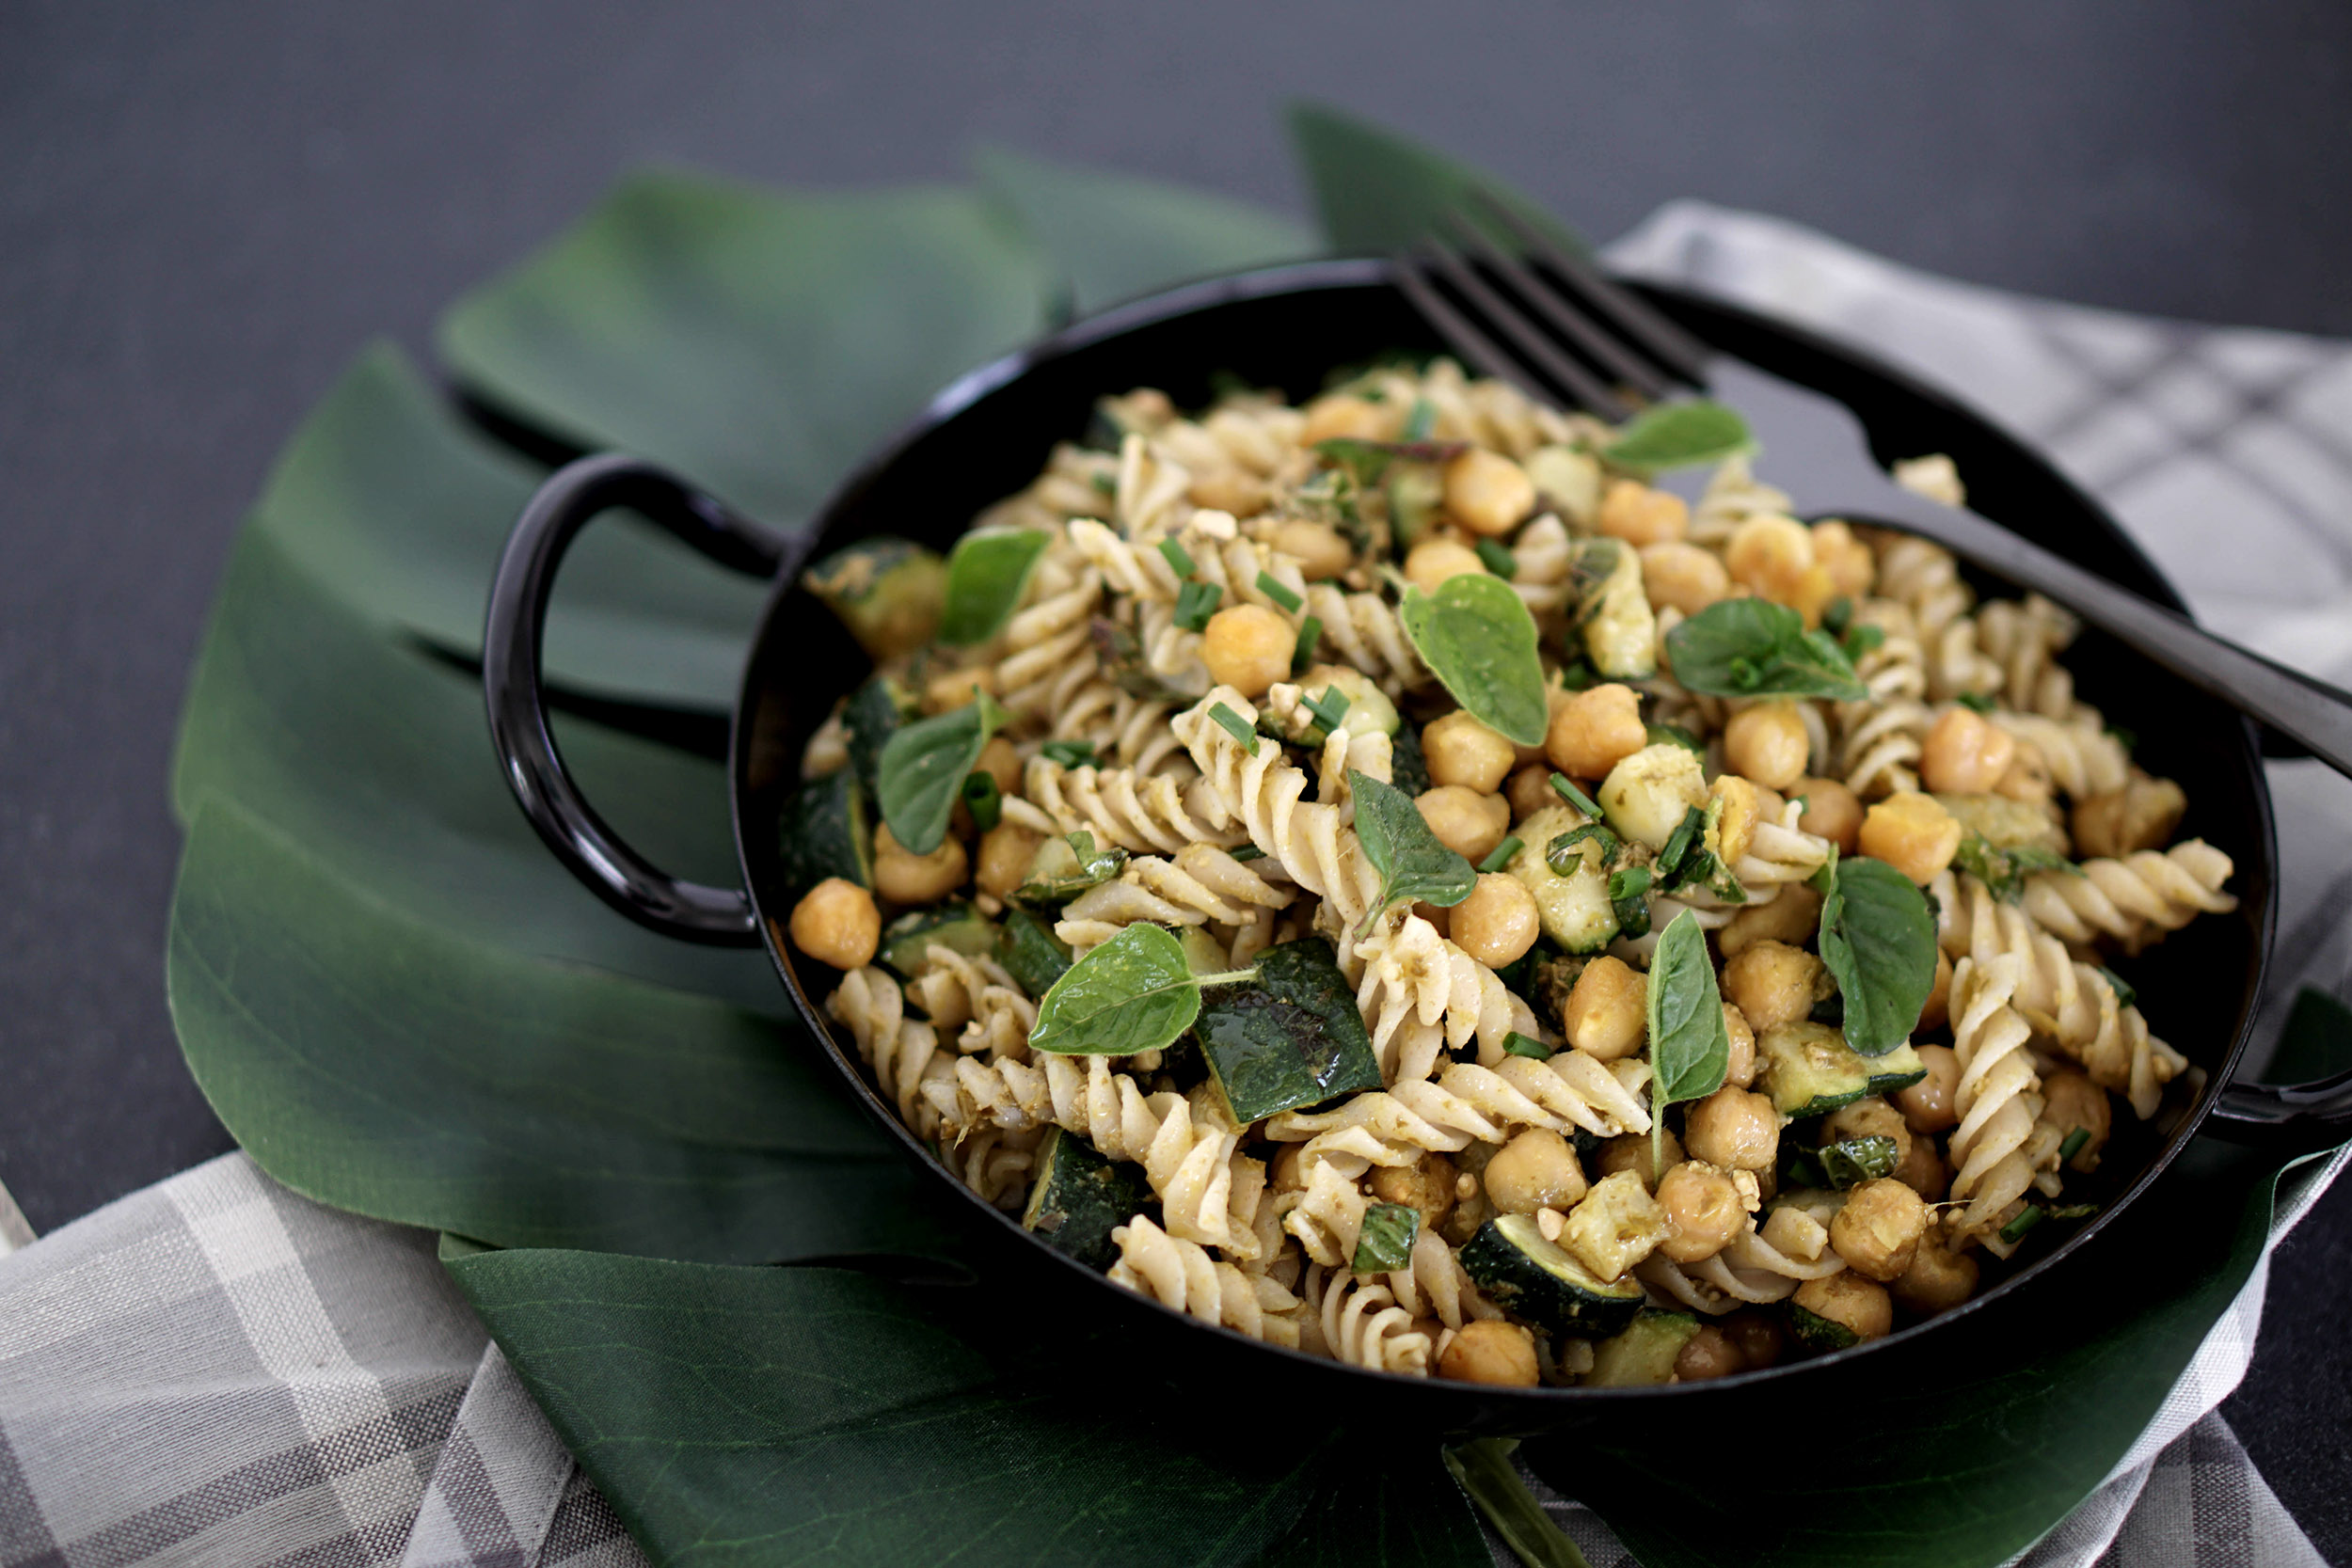 Green Pasta Rezept Nudelsalat zum Mitnehmen ins Büro